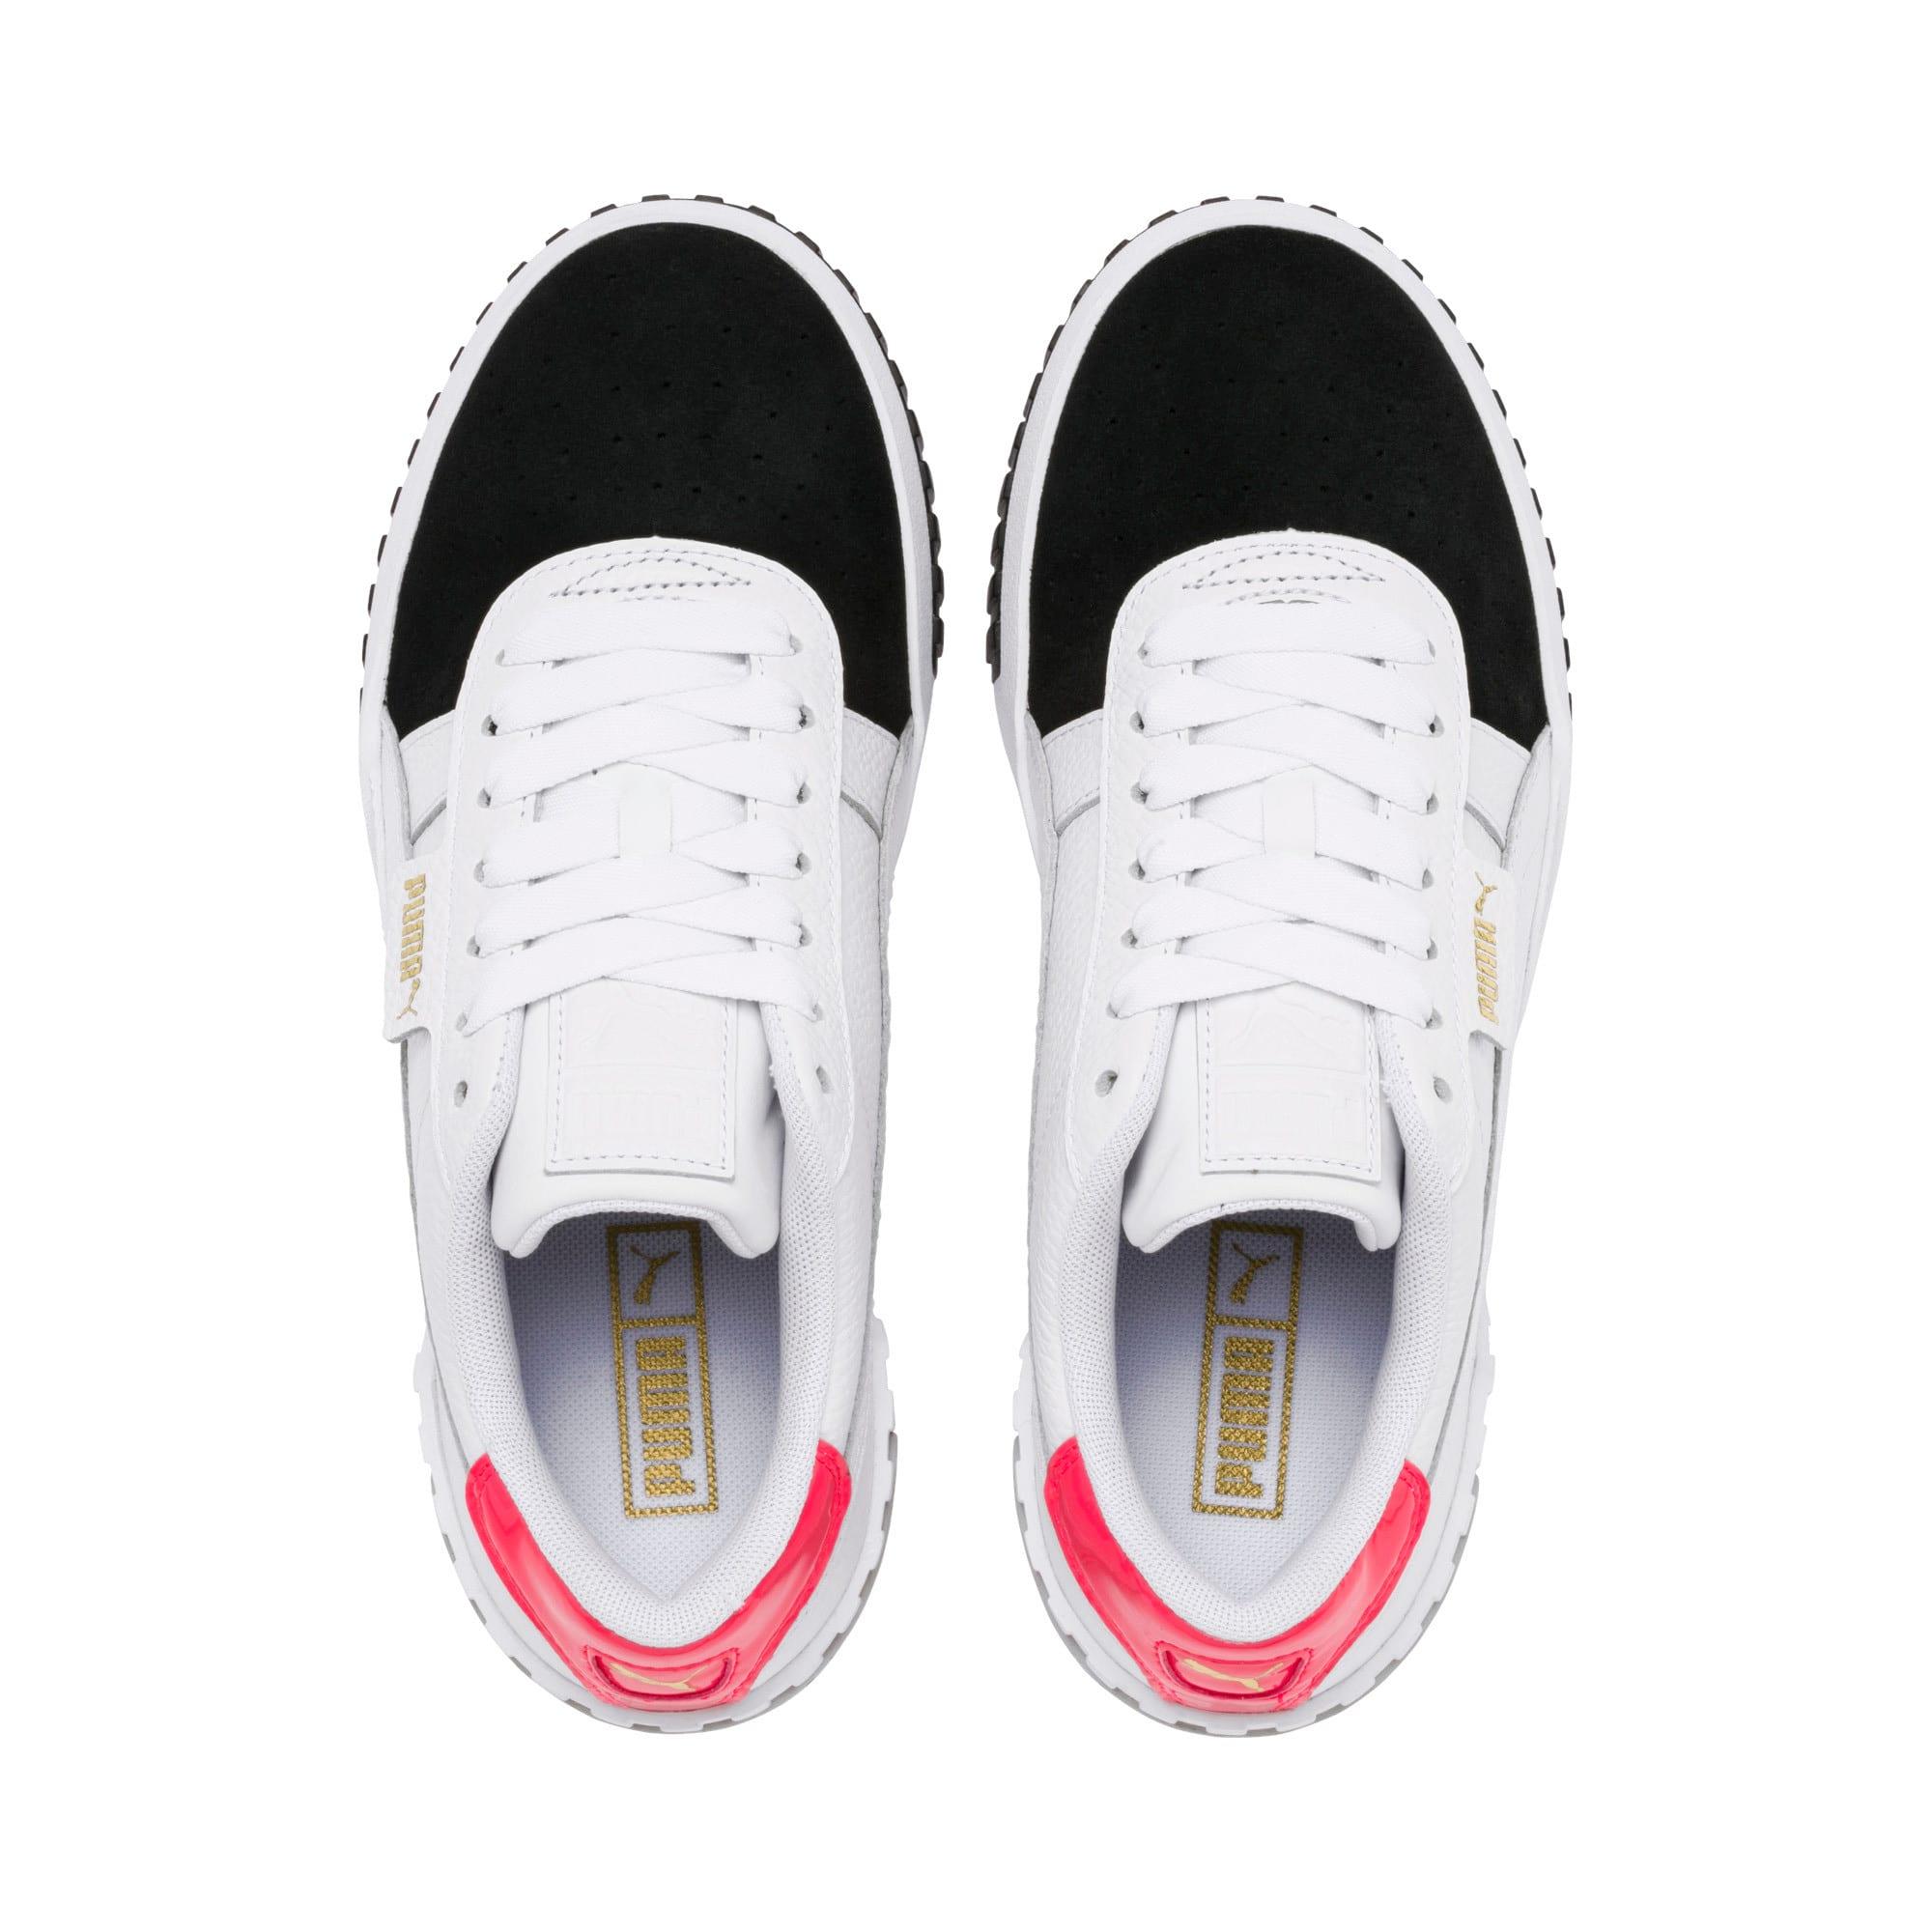 Thumbnail 7 of Damskie buty sportowe Cali Remix, Puma White-Puma Black, medium